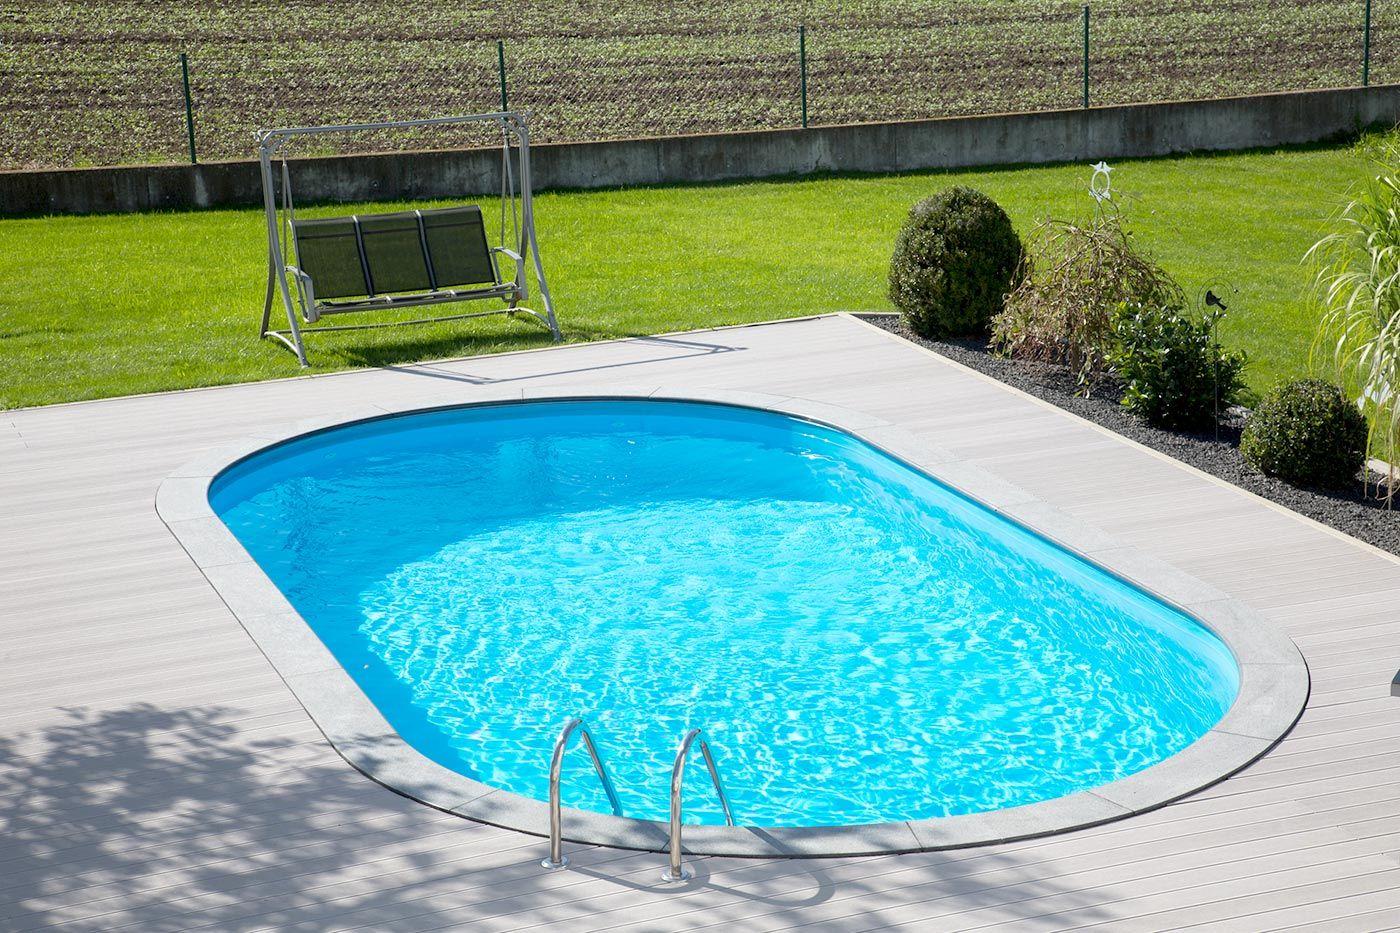 Inground Swimming Pools Prices Installed Nz Swimming Pool Prices Pool Prices Pool